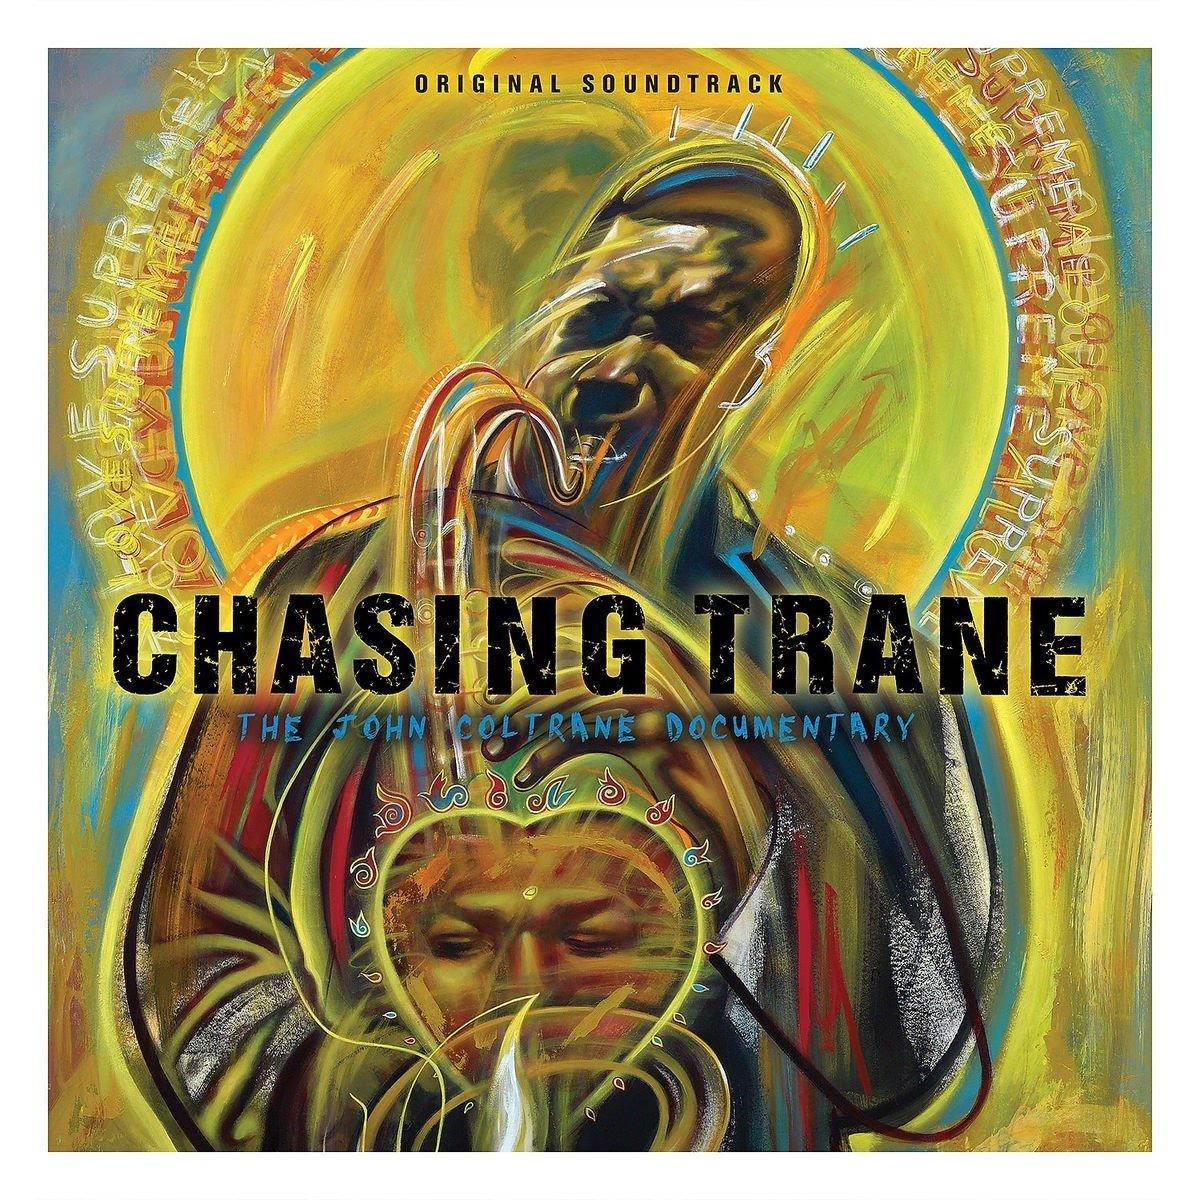 Chasing Trane - Original Soundtrack - Vinyl